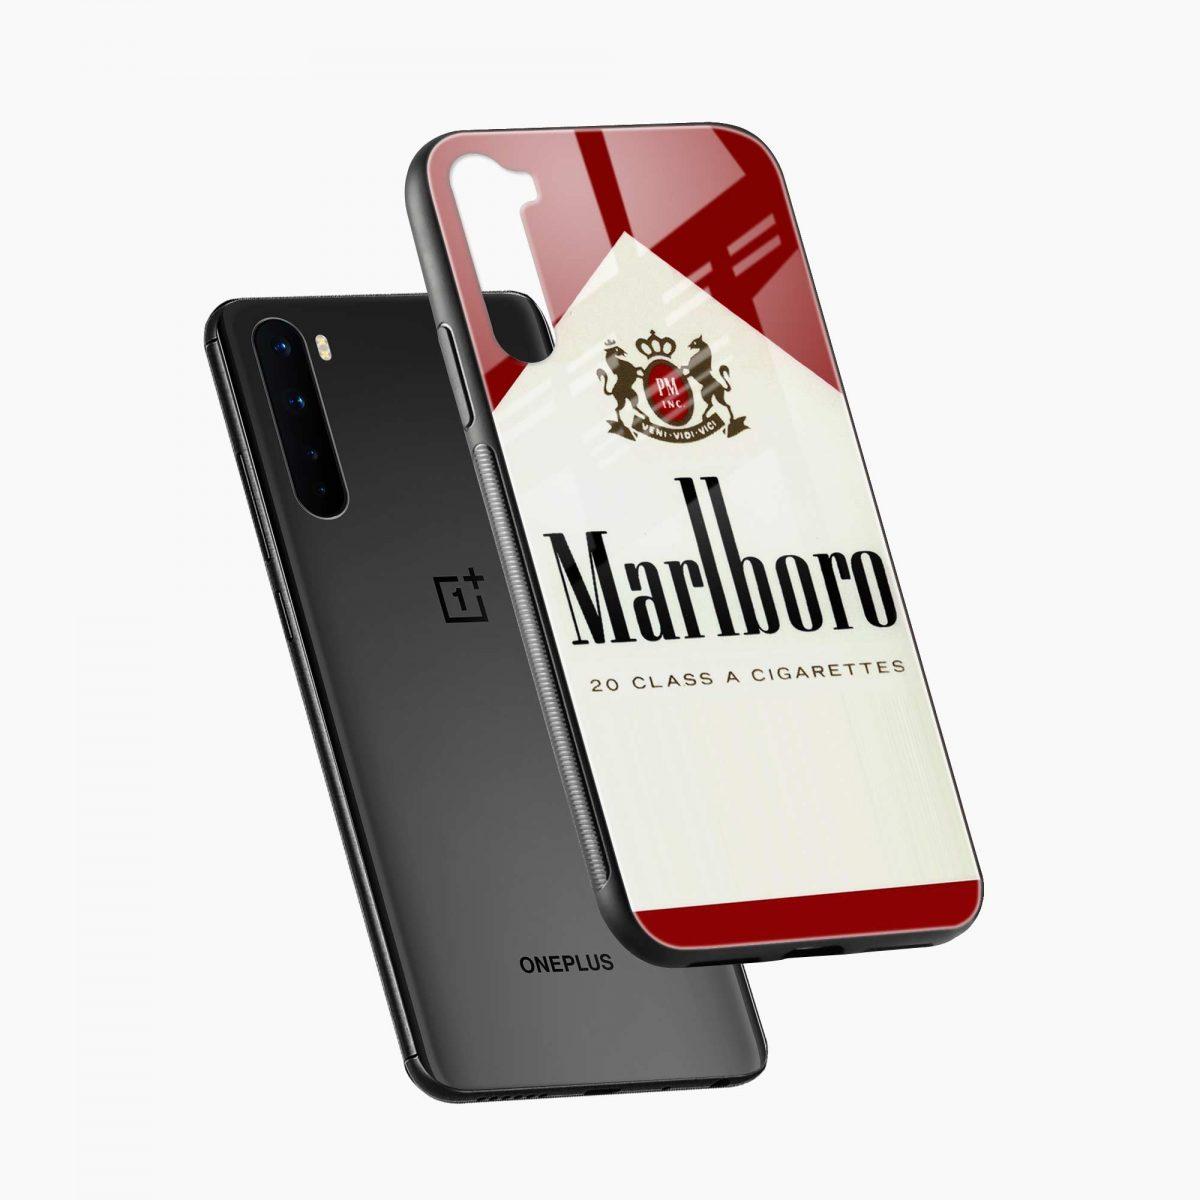 marlboro cigarette box diagonal view oneplus nord back cover